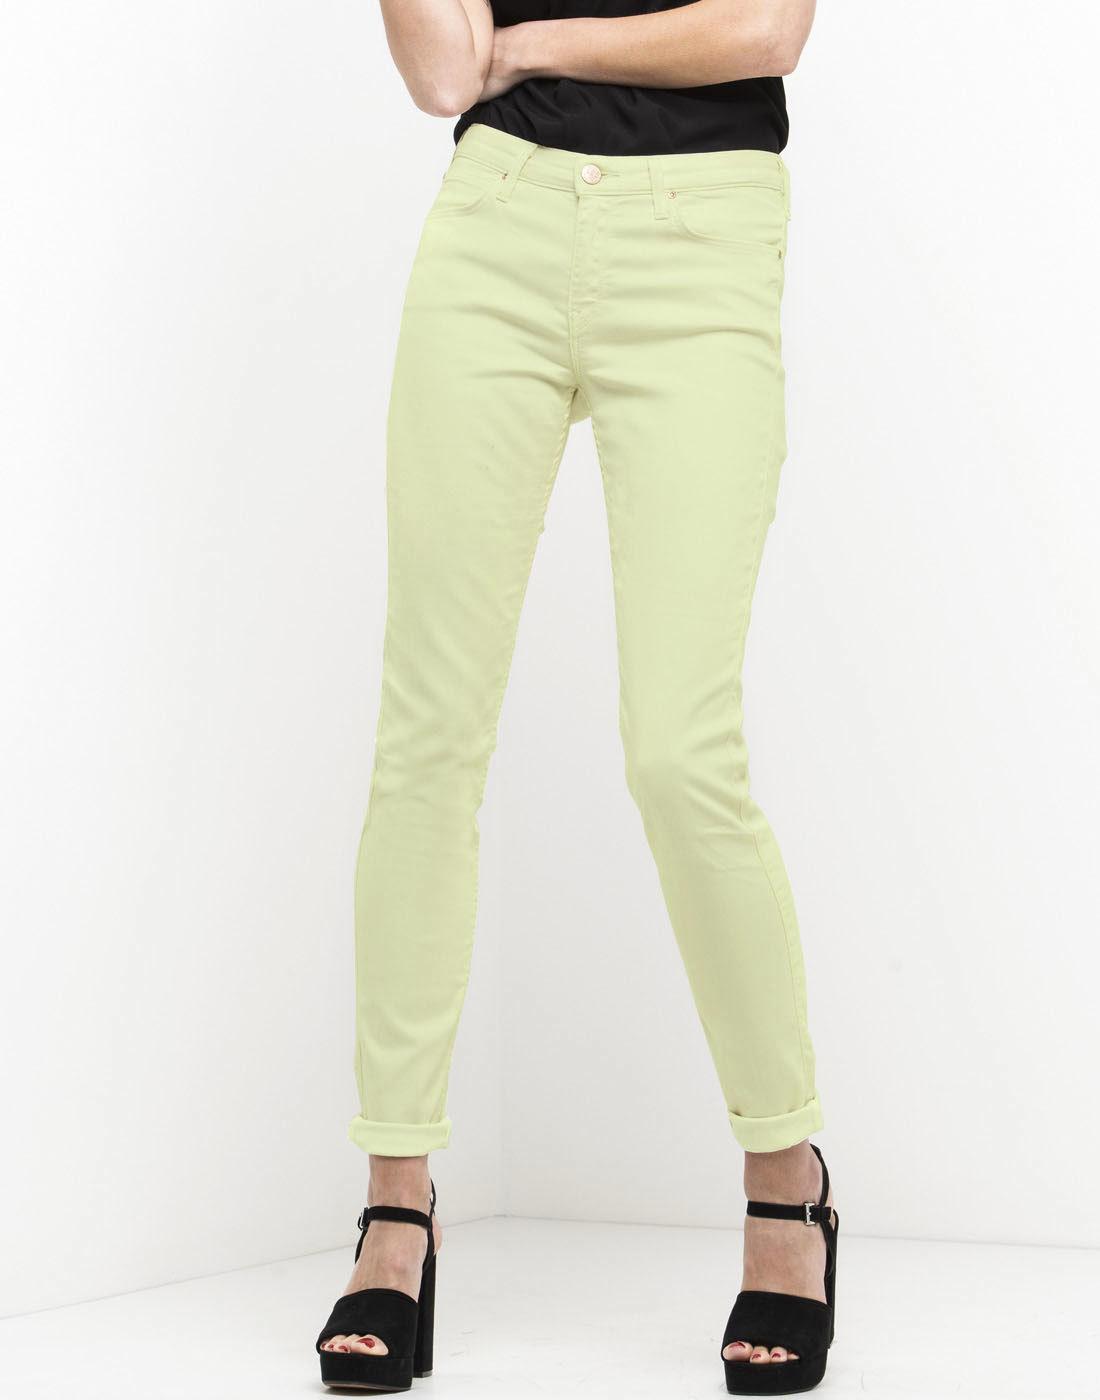 Jodee LEE Retro Super Skinny Denim Jeans LIME